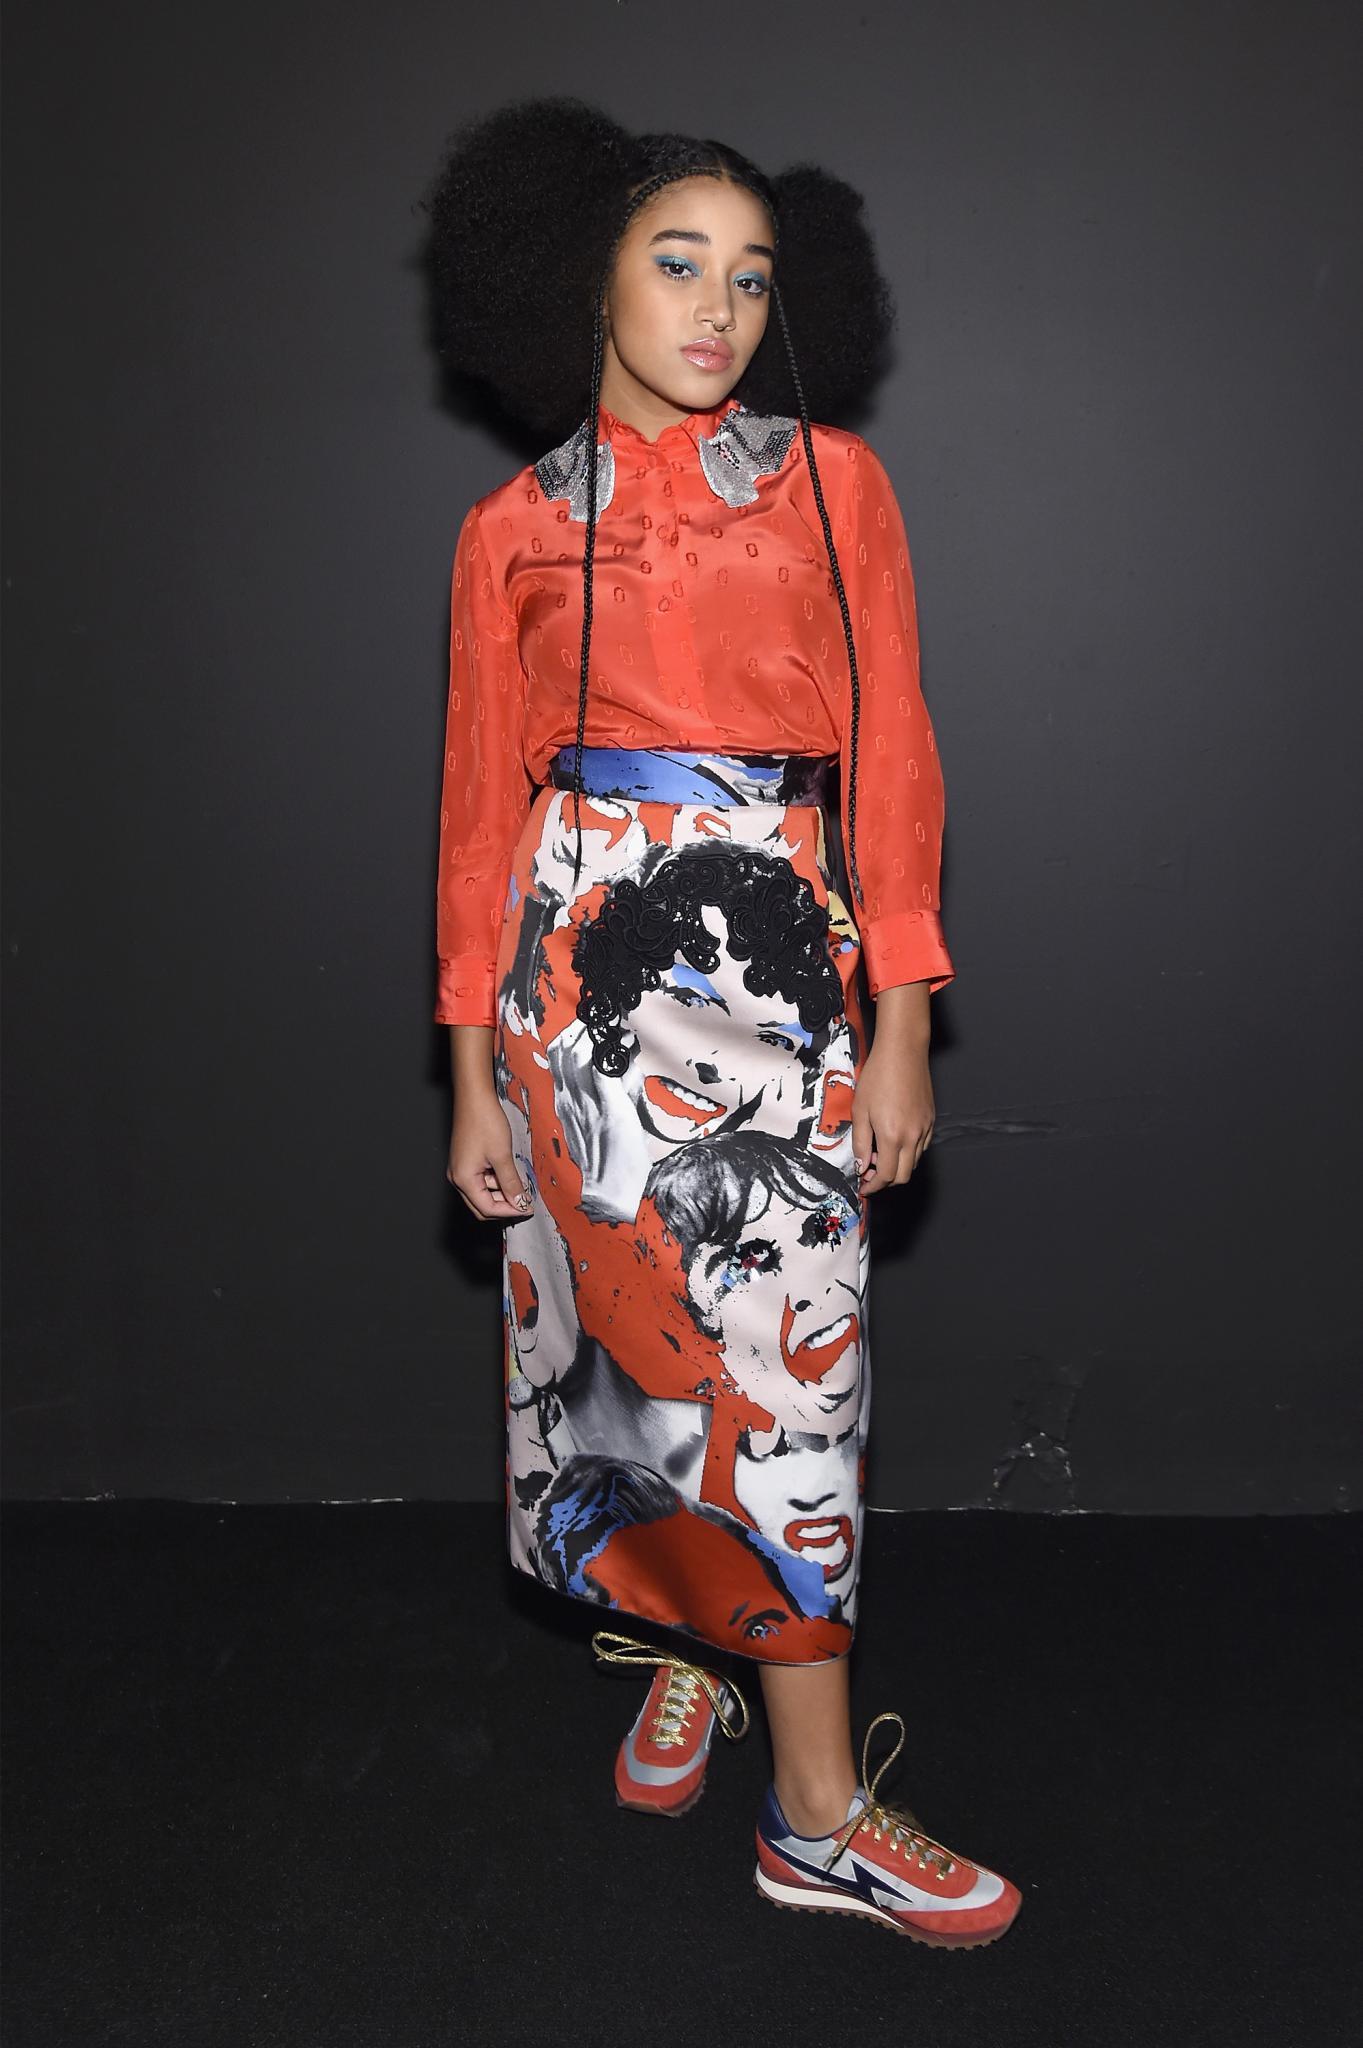 Amandla Stenberg to Star in 'Black Lives Matter' Inspired Movie